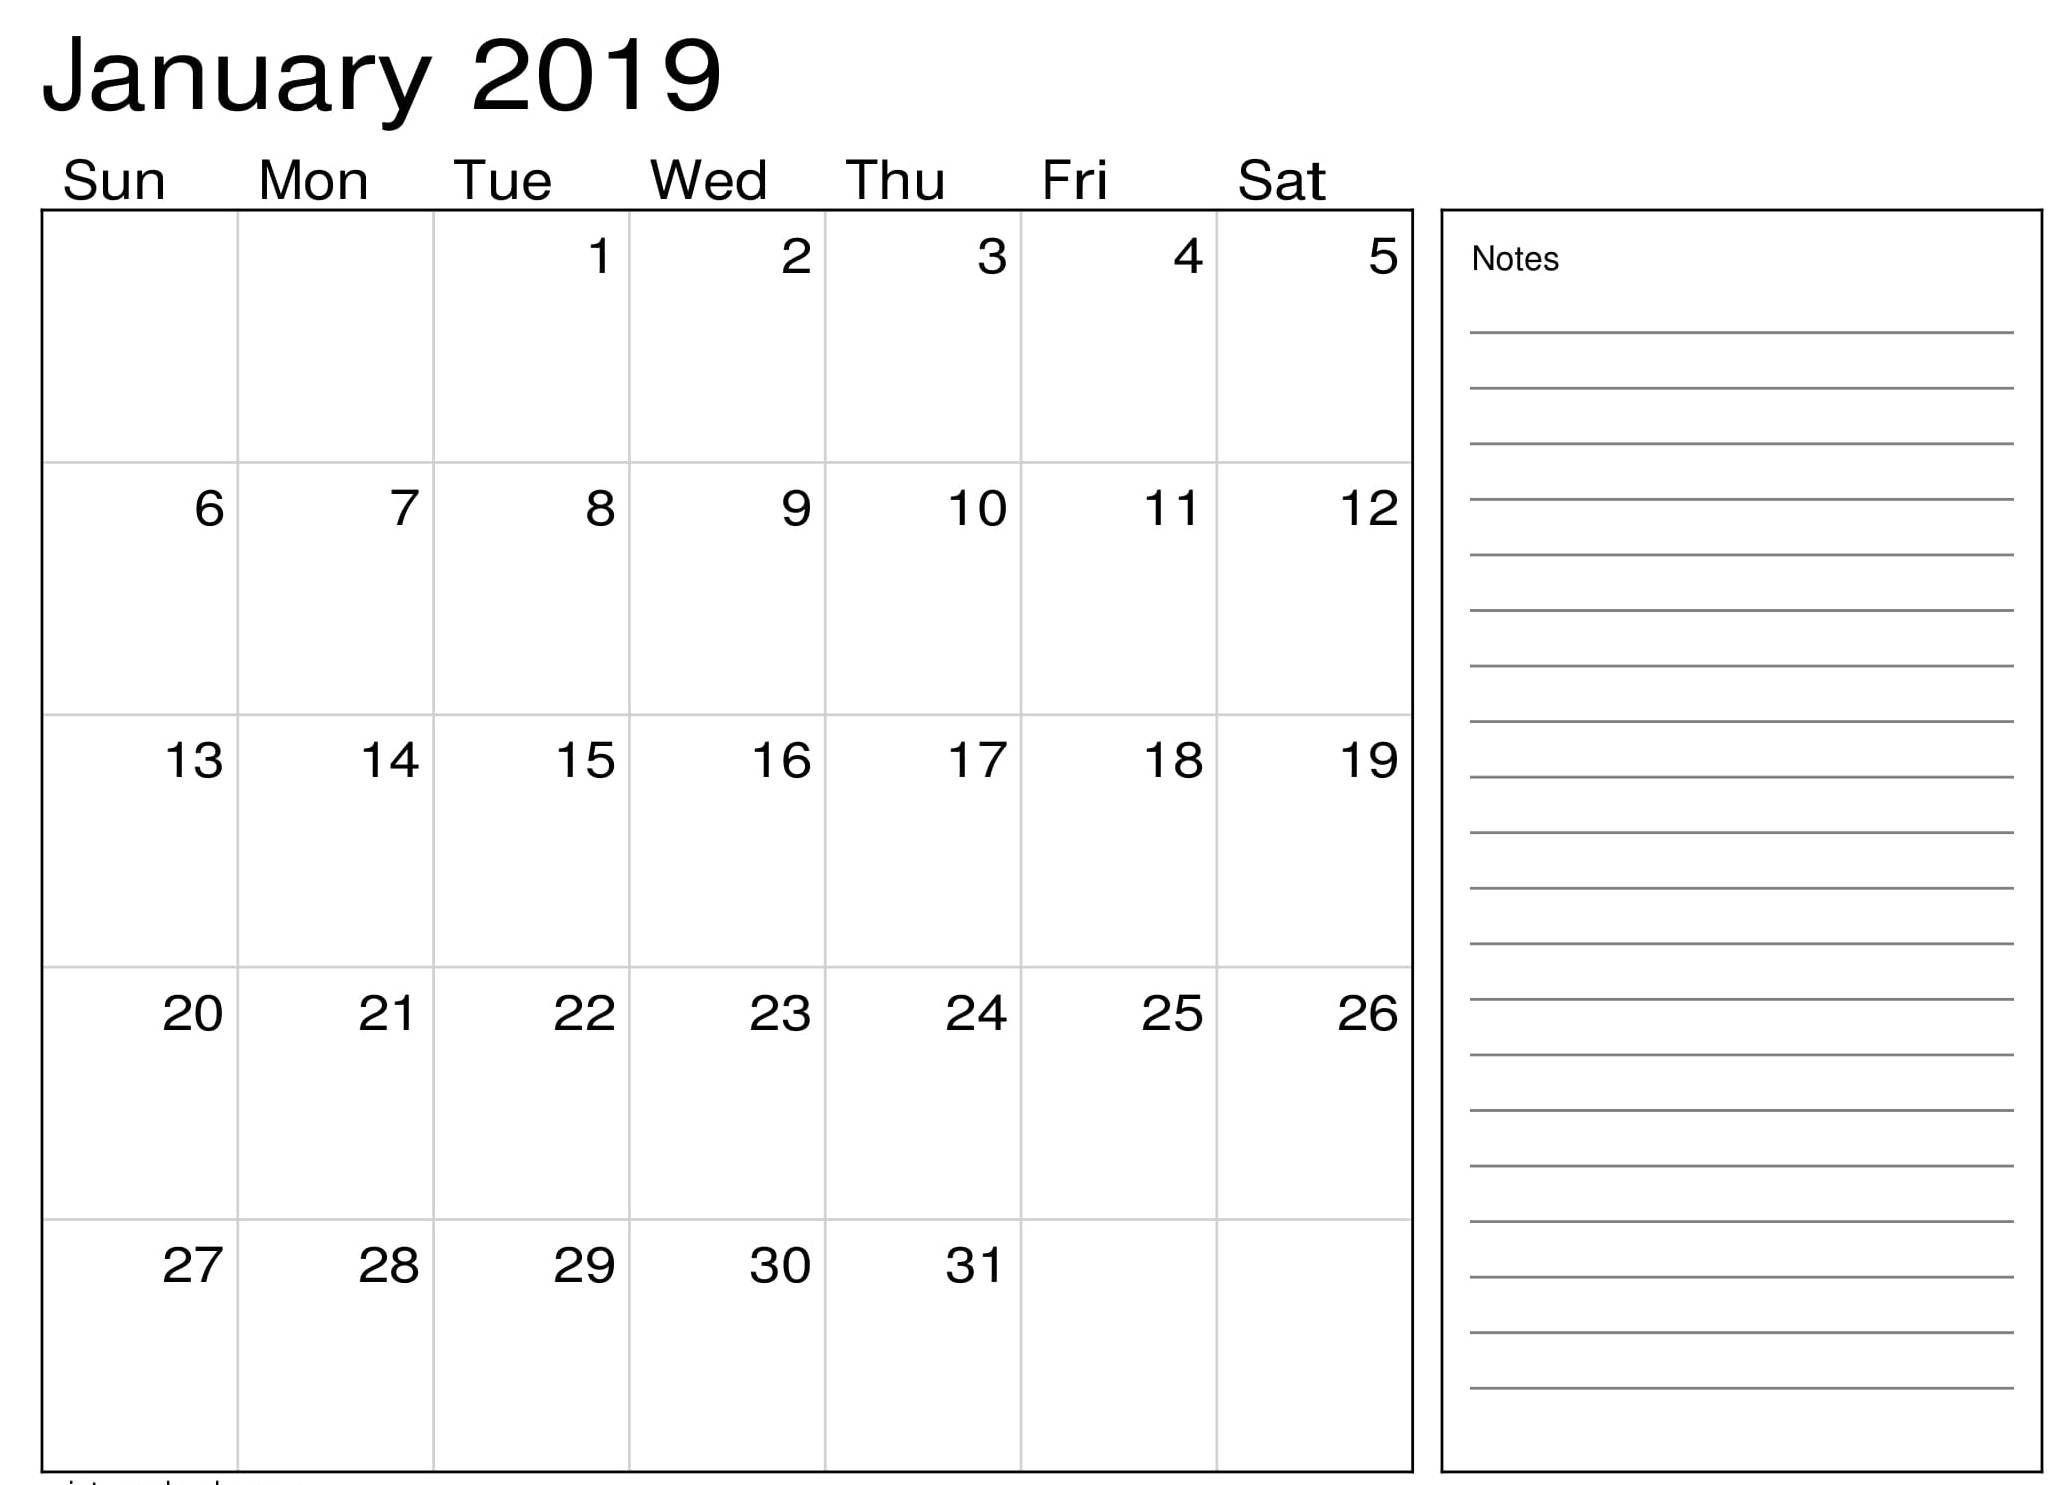 January 2019 Calendar Pdf (With Images) | August Calendar